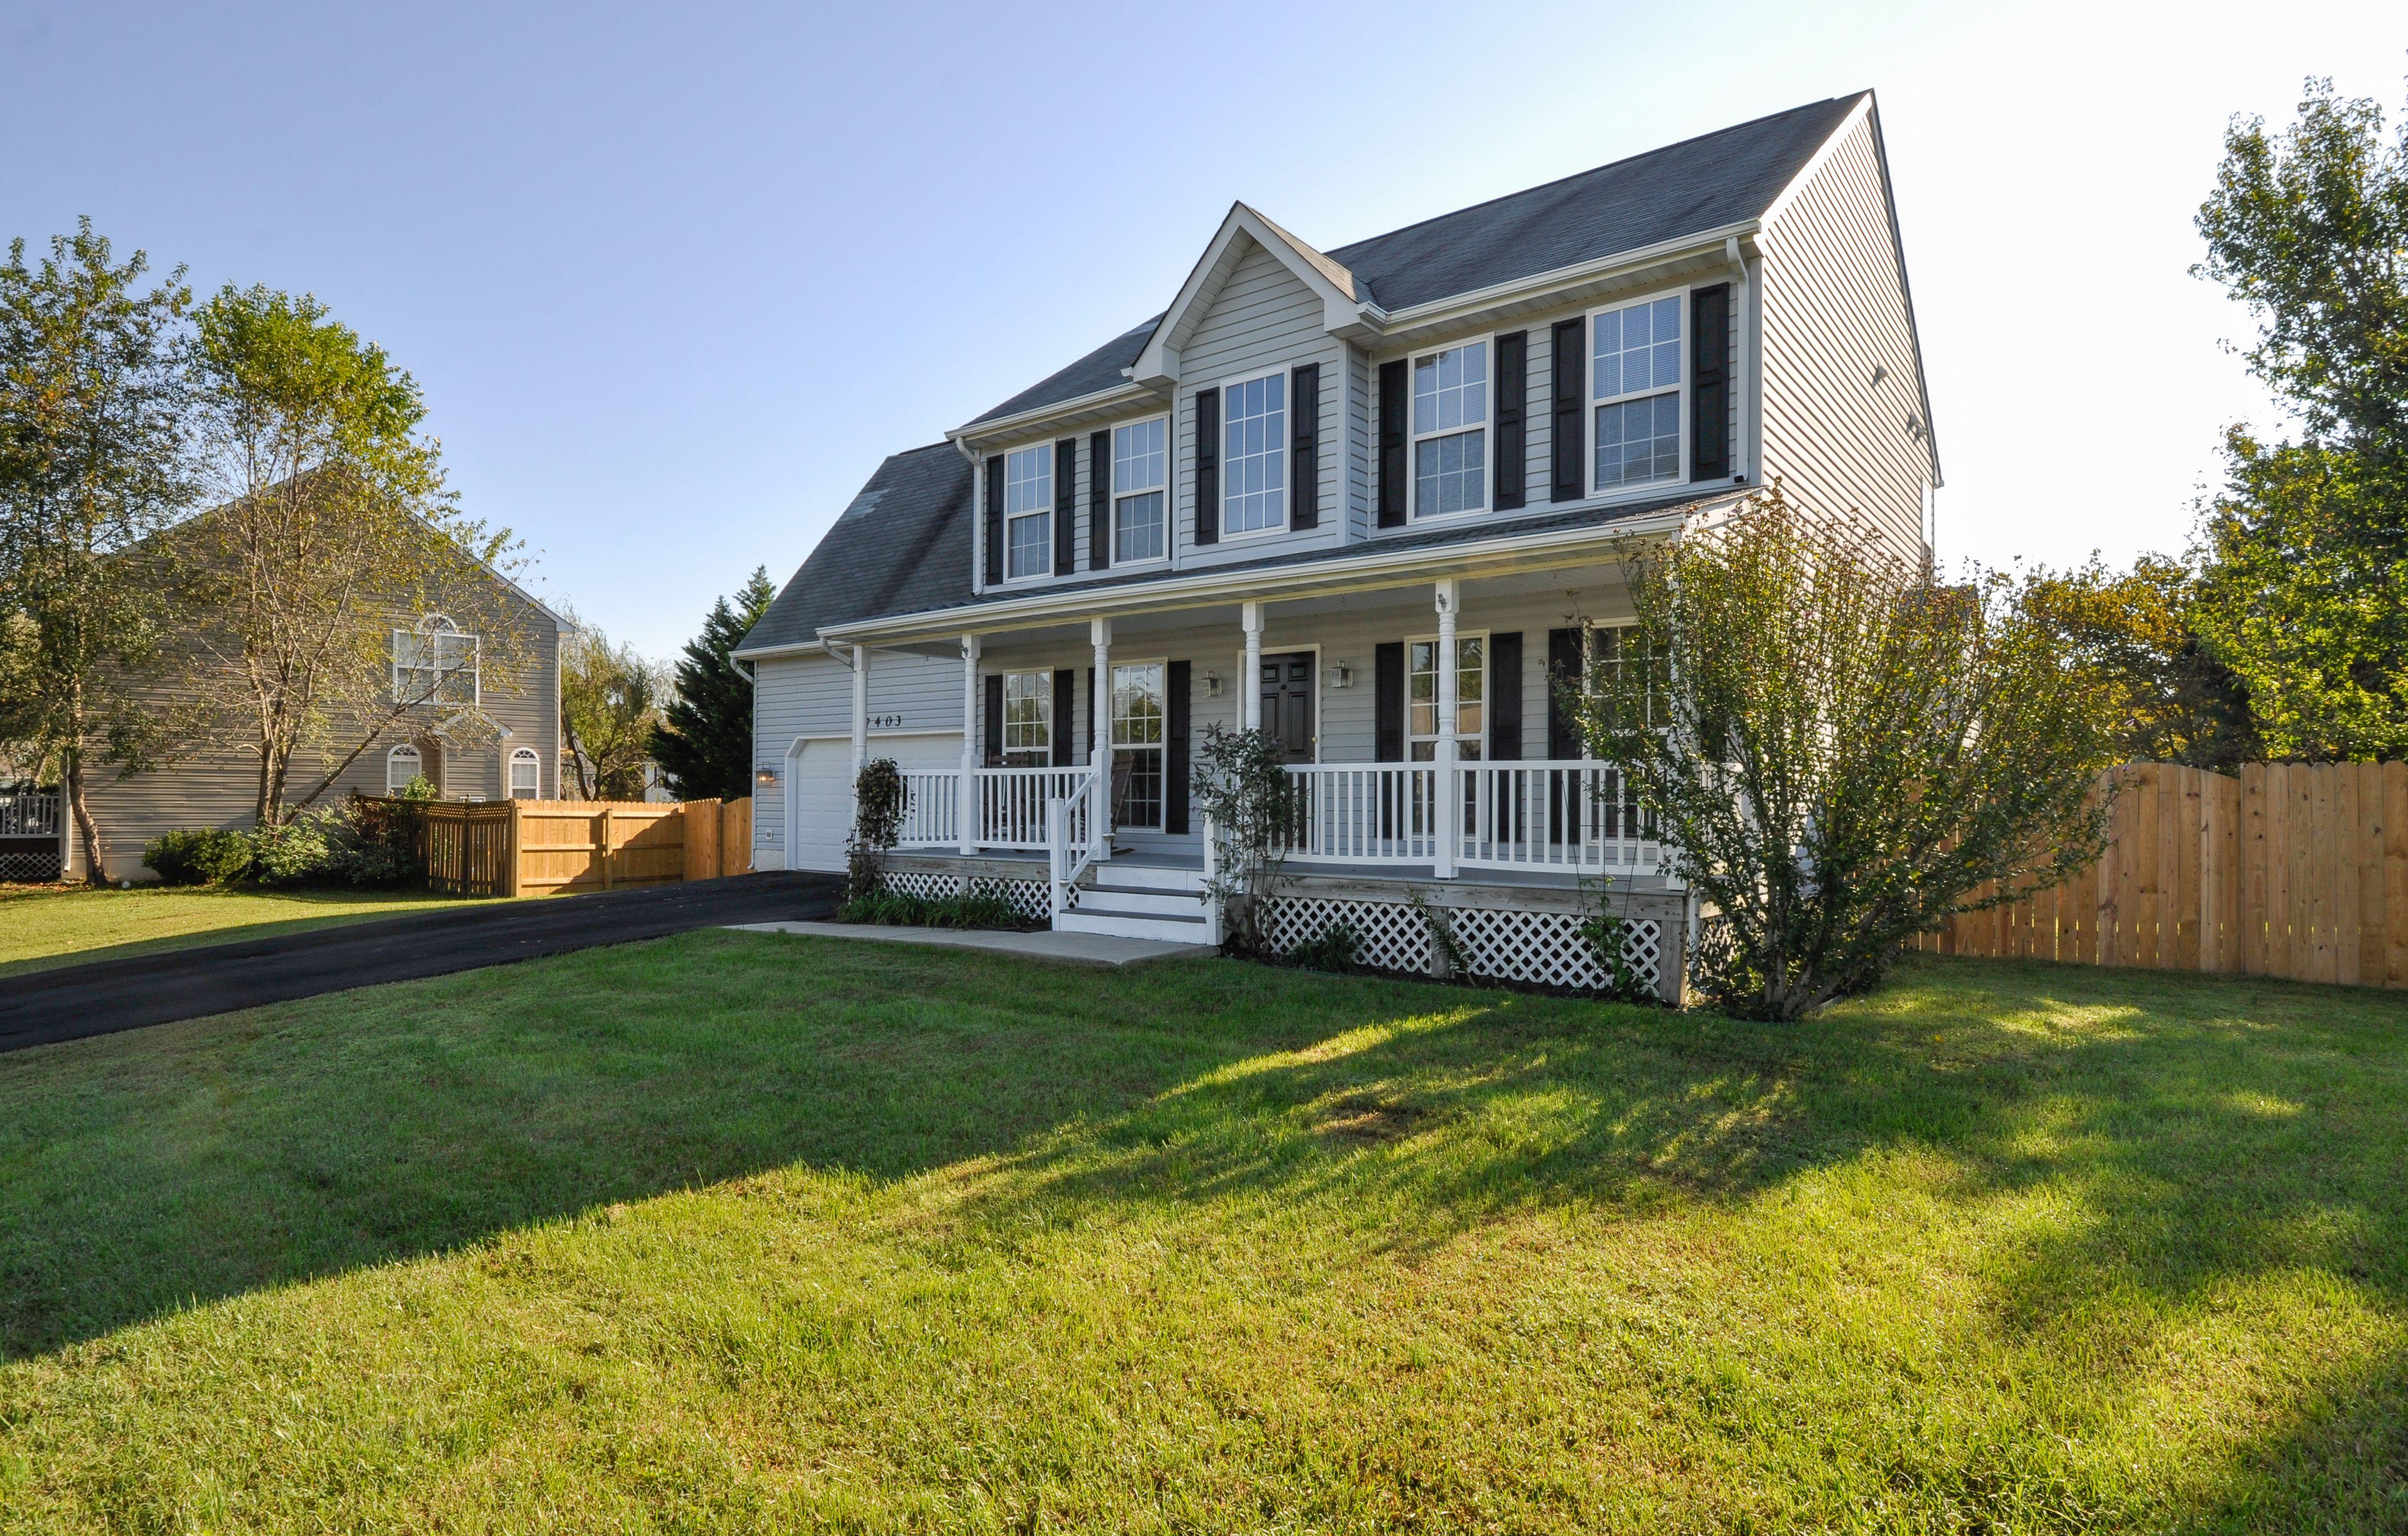 7403 Harvest Ln Fredericksburg Va 22407 House Styles Bedroom Size Real Estate